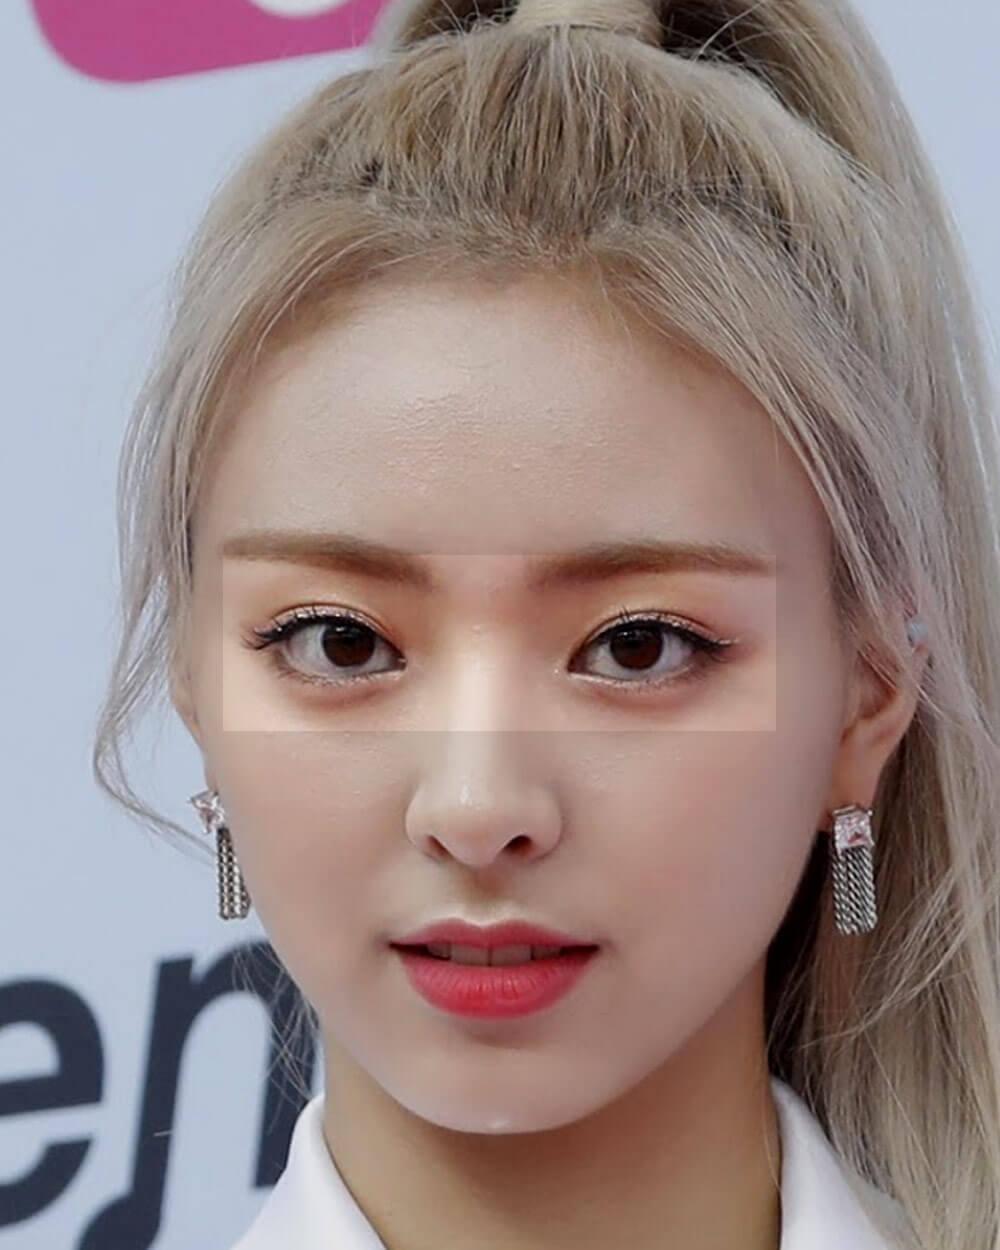 Larger eyes in Korean beauty standards